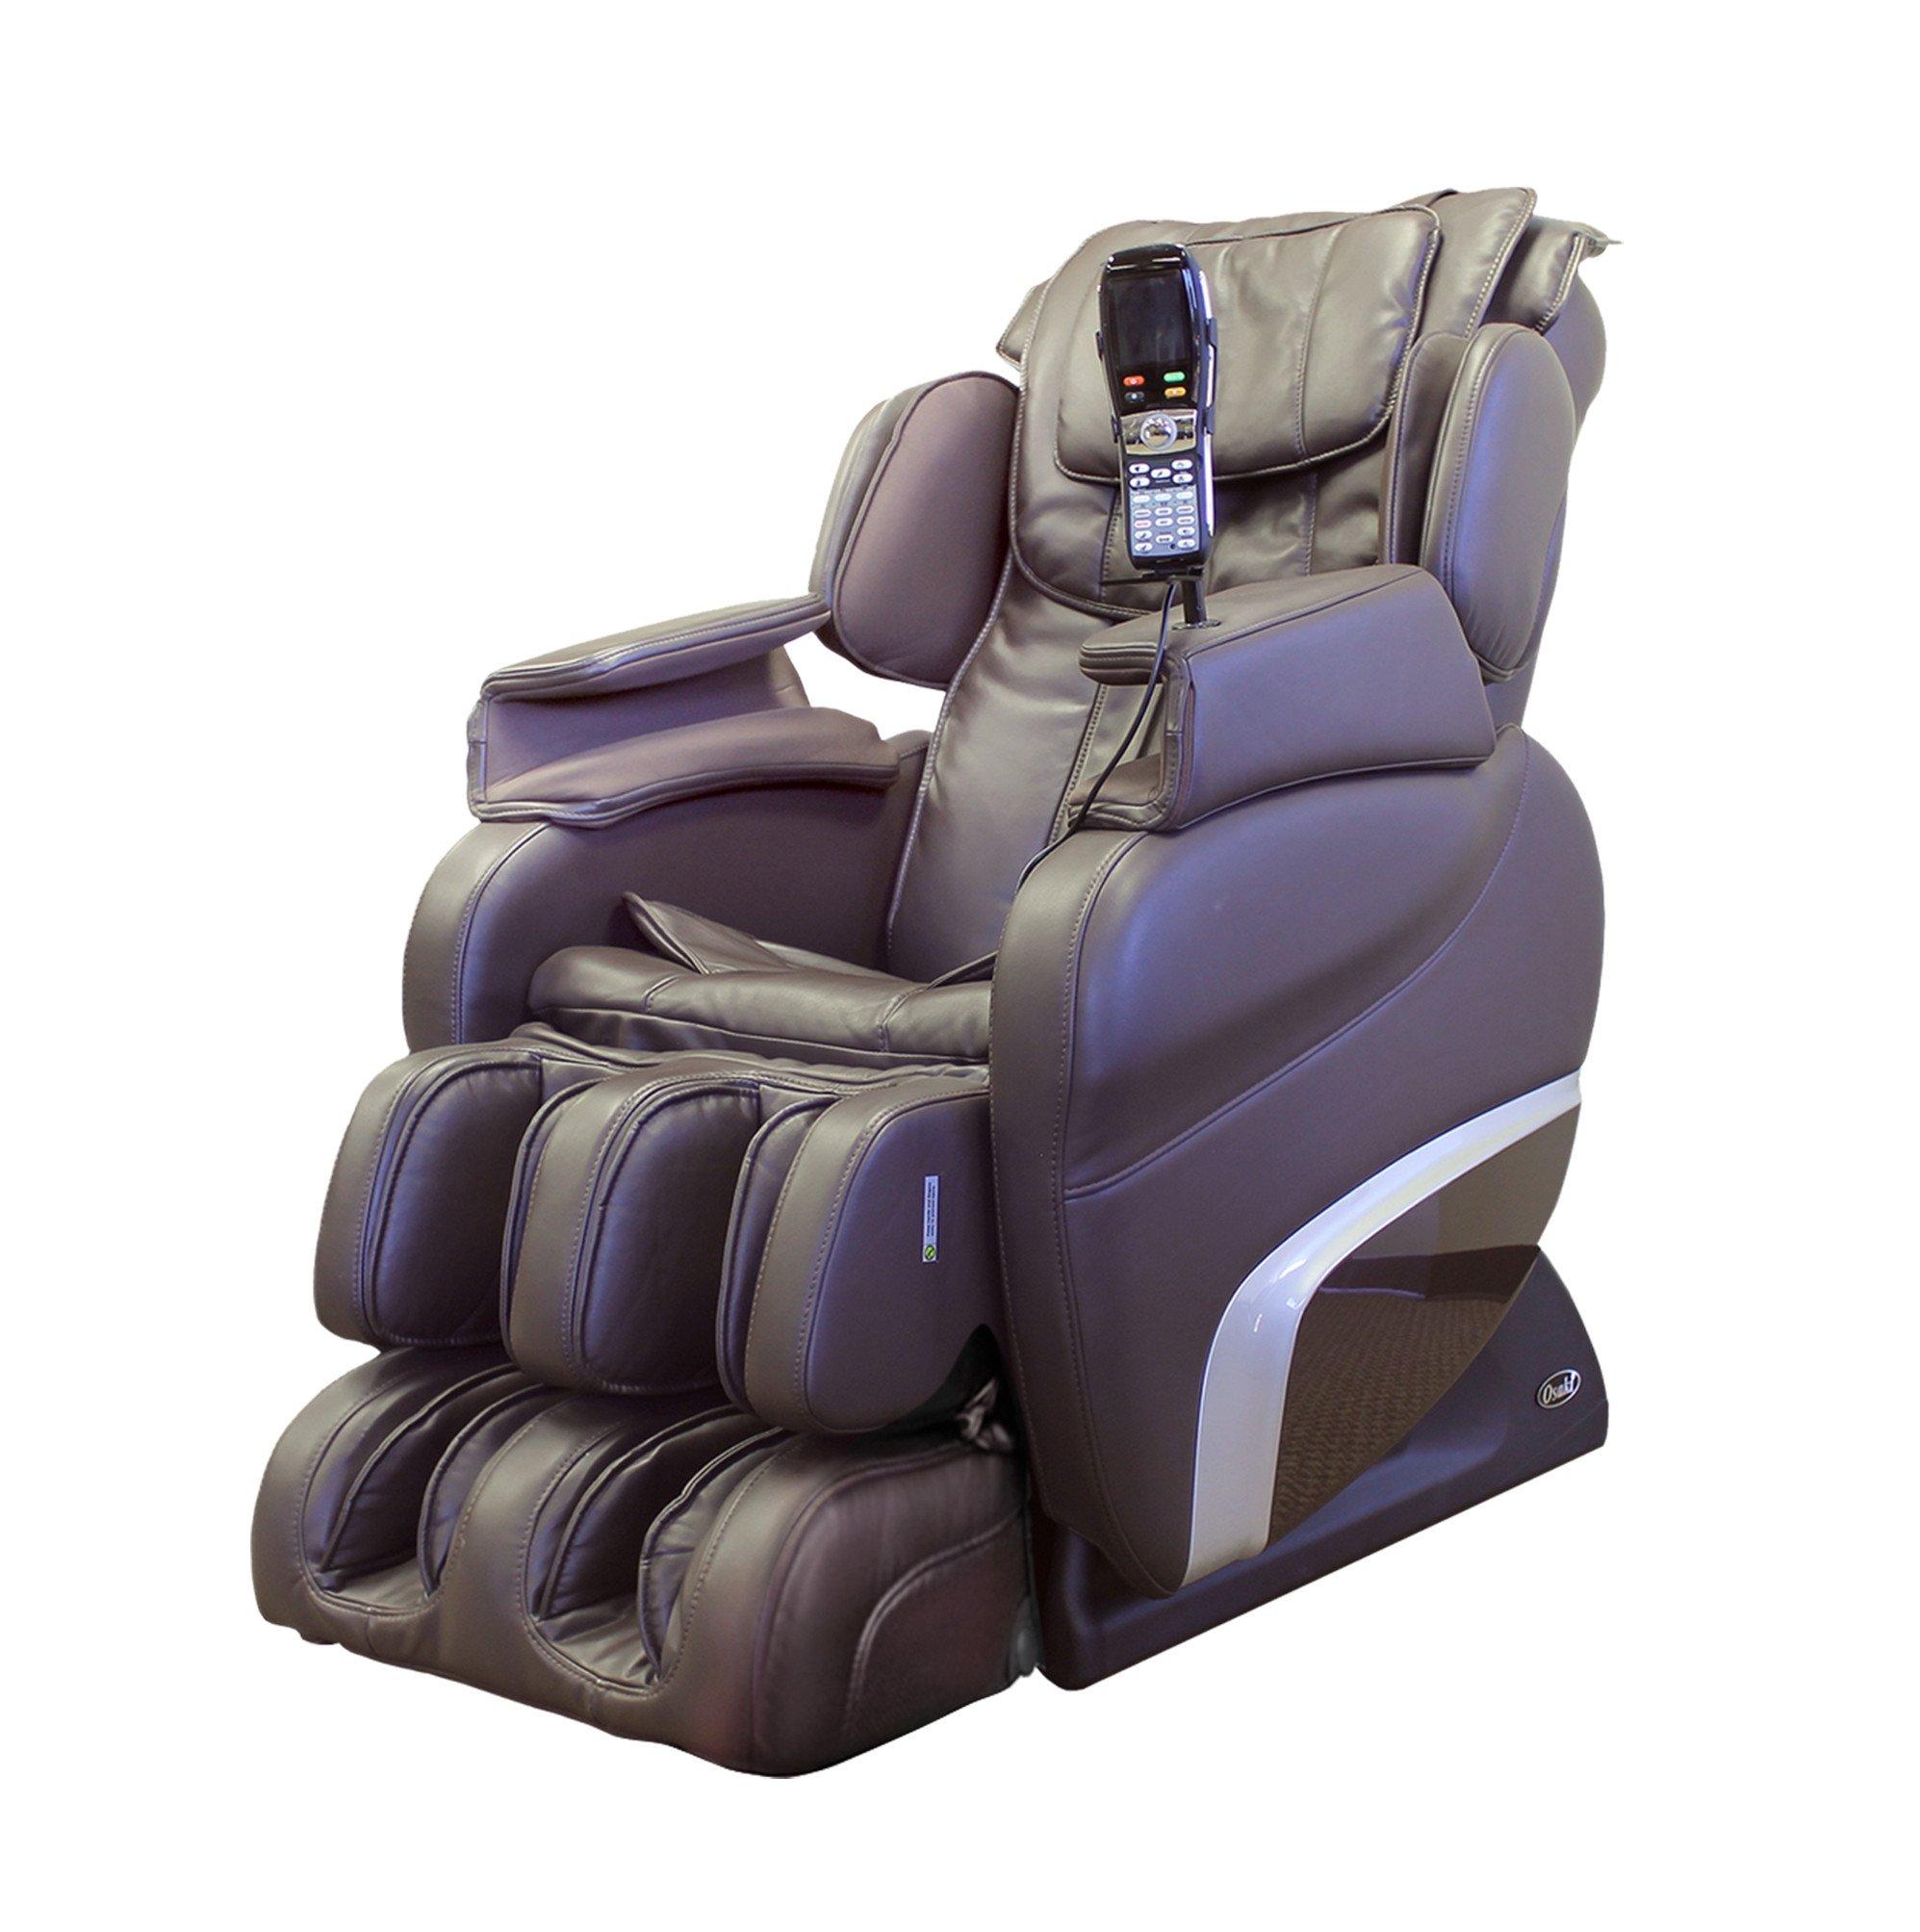 Osaki OS 4000 Zero Gravity Deluxe Massage Chair (OPEN BOX)